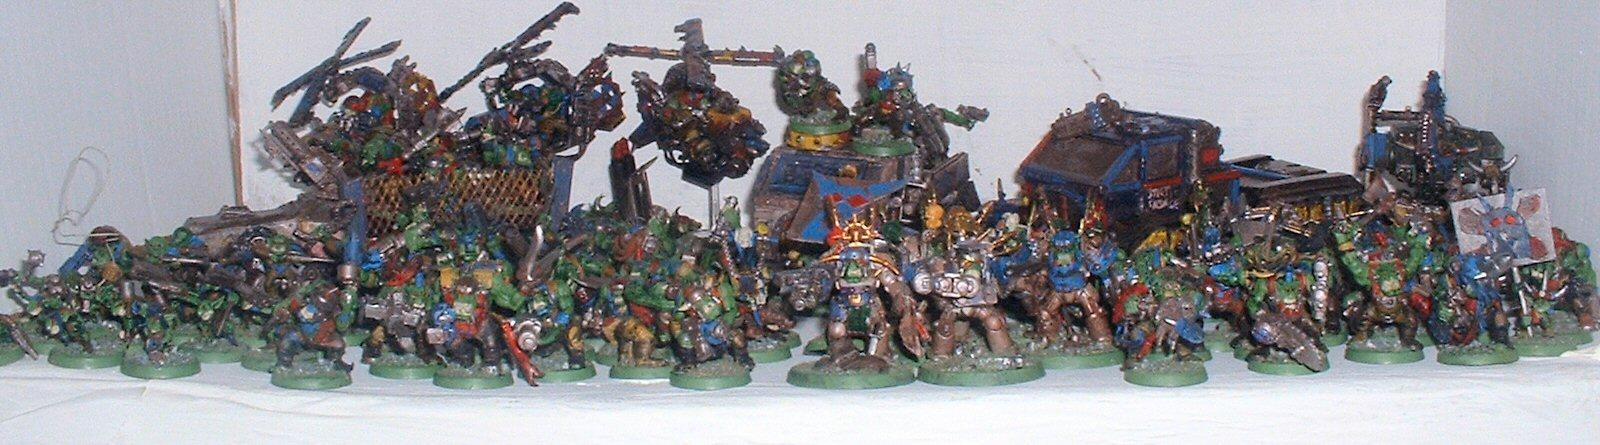 Deth Skull, Ork Army, Orks